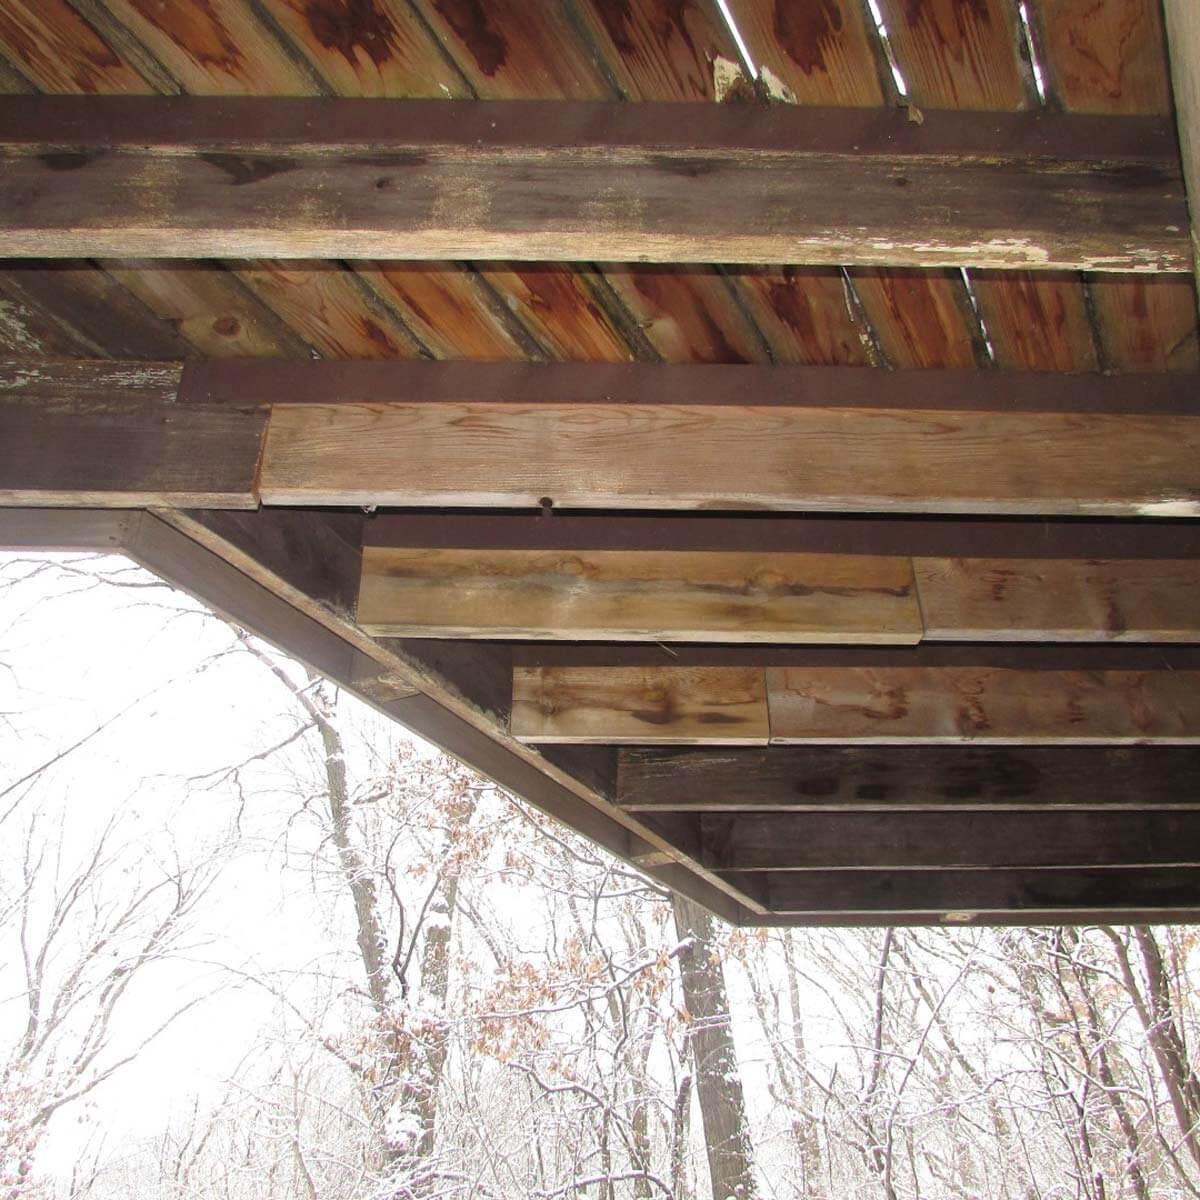 Framing with scrap lumber